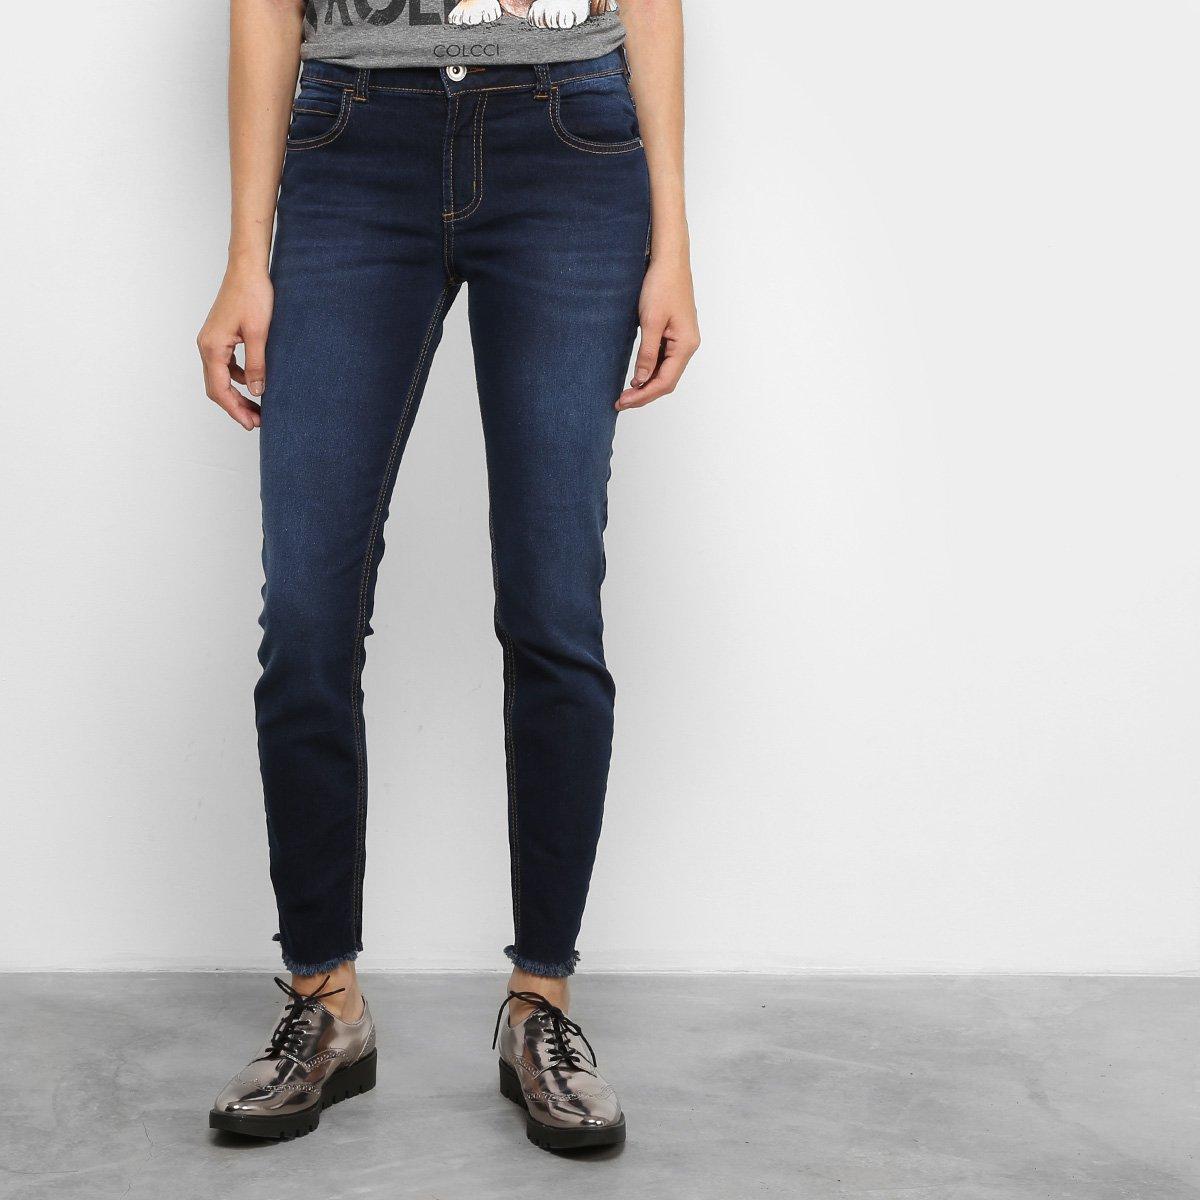 107fb4838 Calça Jeans Skinny Colcci Fátima Cintura Média Feminina